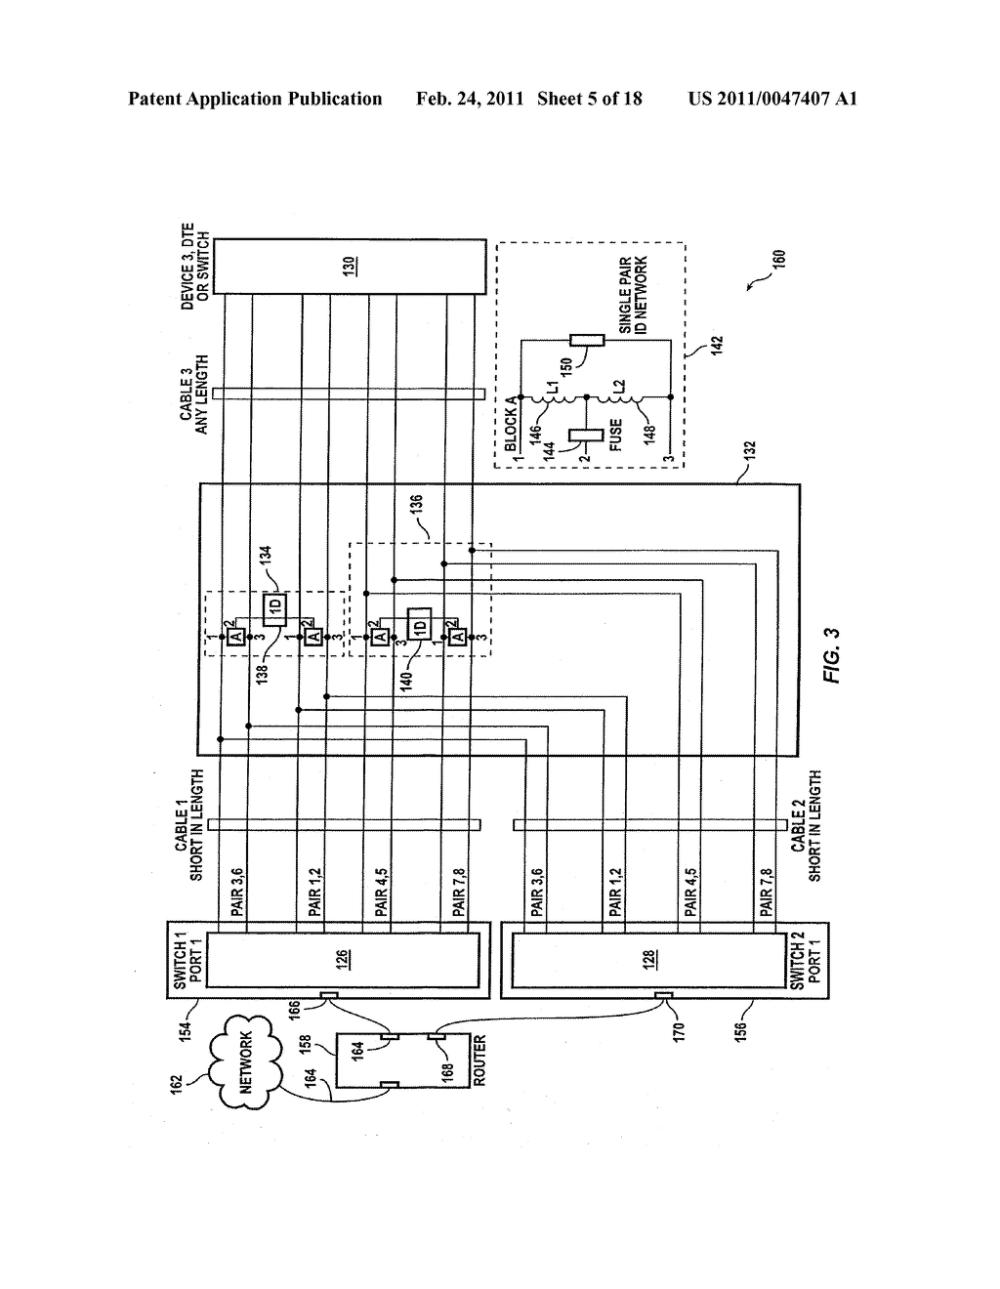 medium resolution of warn 2 5ci diagram aircraft electrical contactor diagram warn winch wiring diagram 1995 suburban wiring diagram